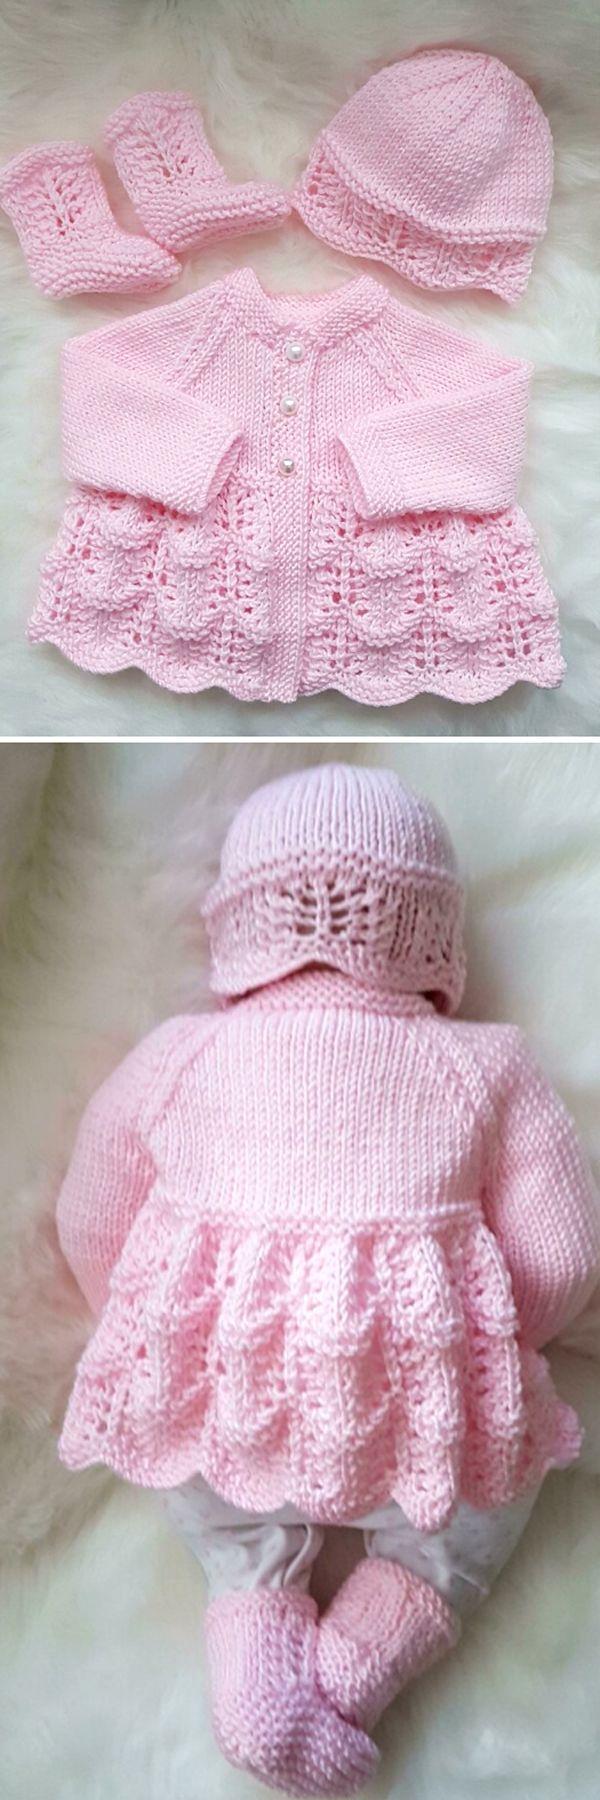 Isabella Baby Cardigan, Hat & Booties - knitting Pattern #vestidosparabebédeganchillo